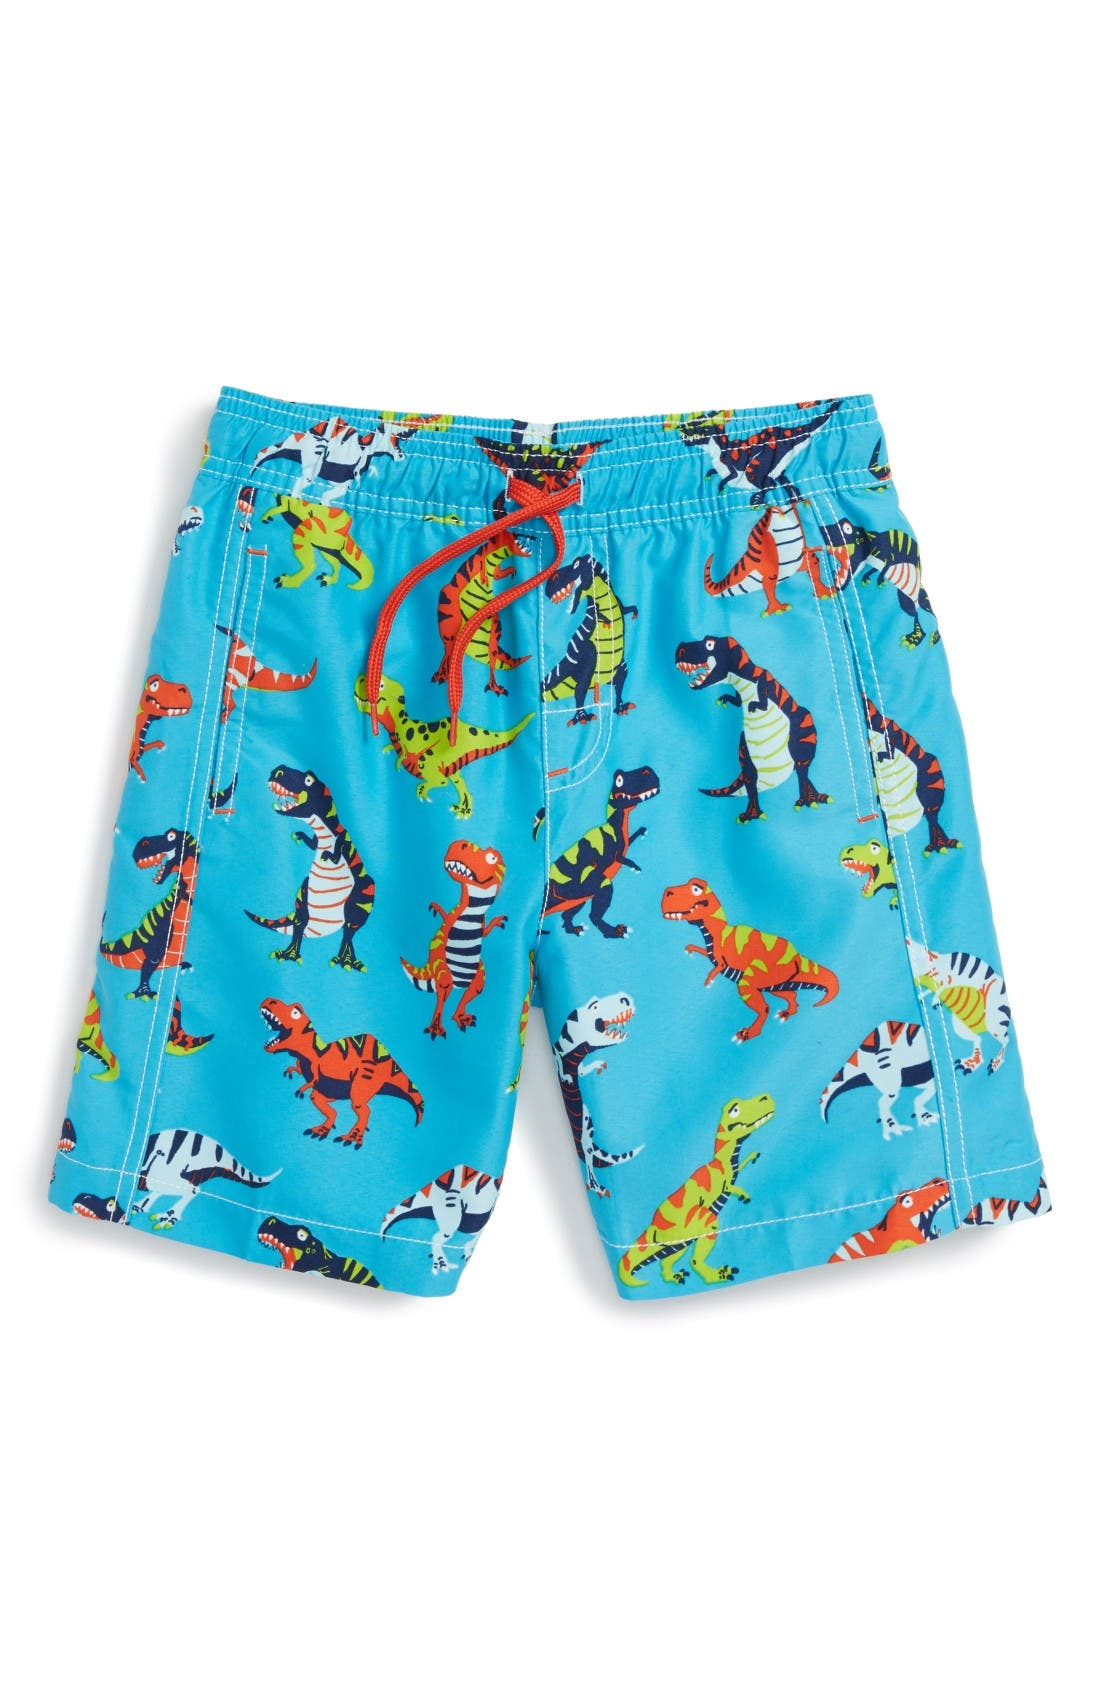 Main Image - Hatley Roaring T-Rex Swim Trunks (Toddler Boys & Little Boys)